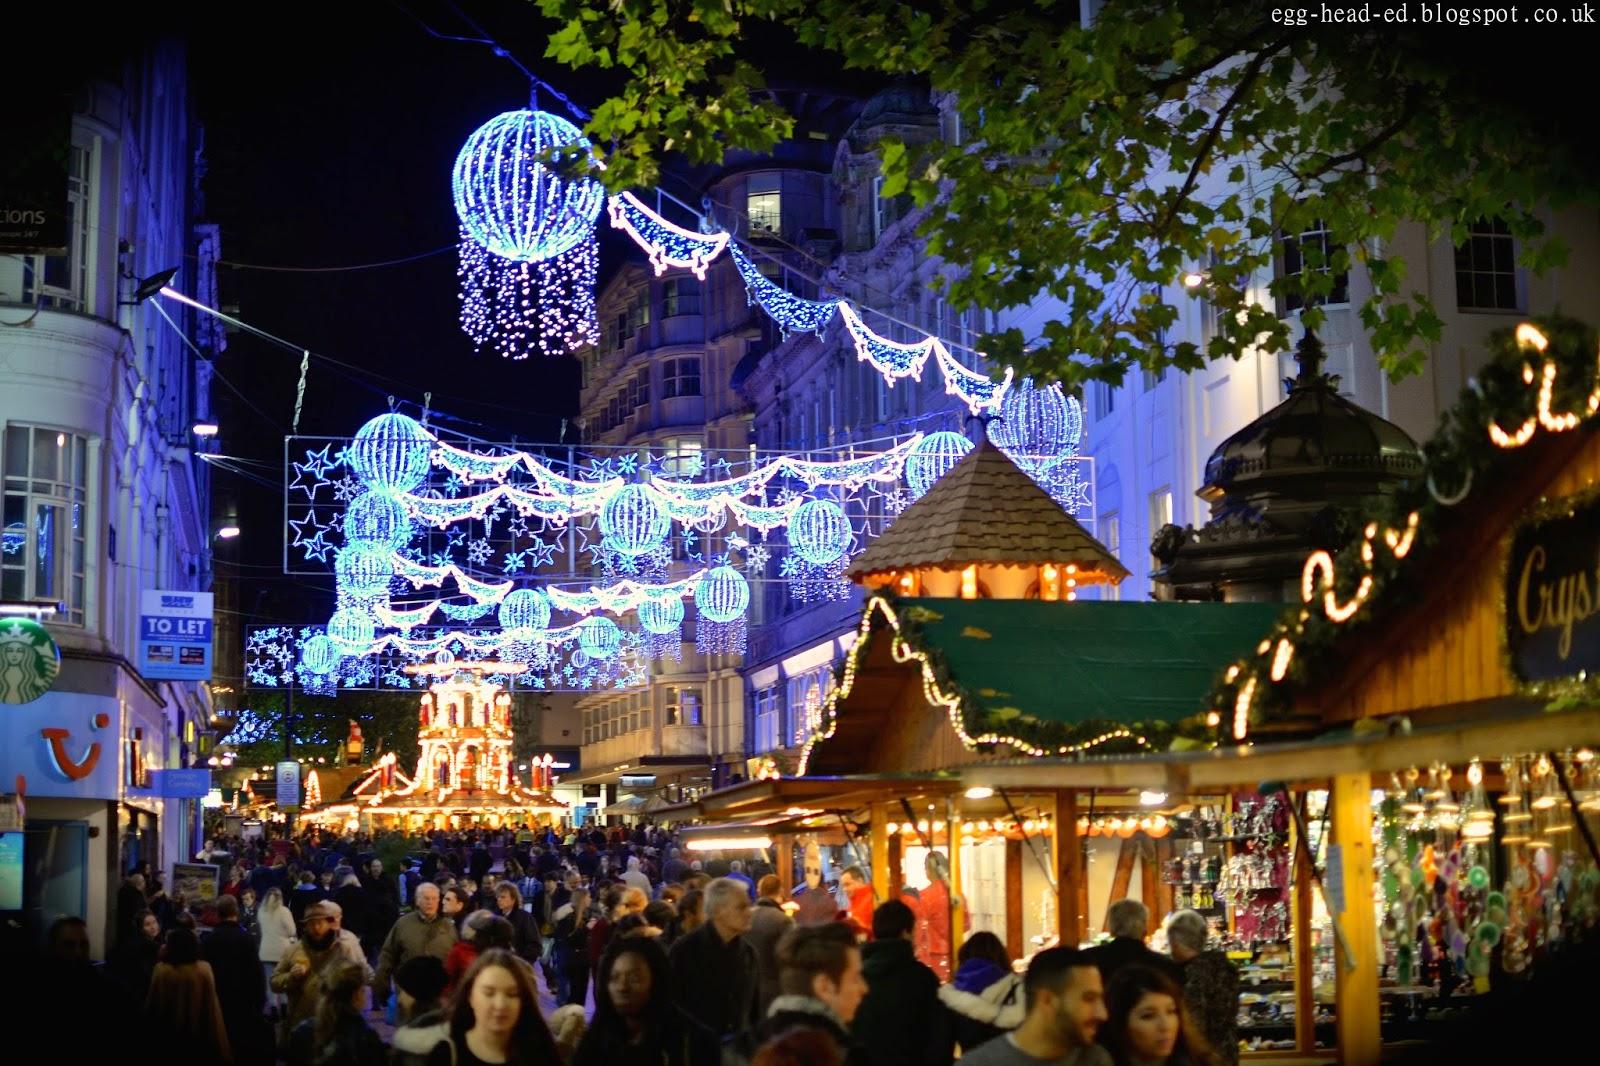 Birmingham Christmas Market High Street Stalls